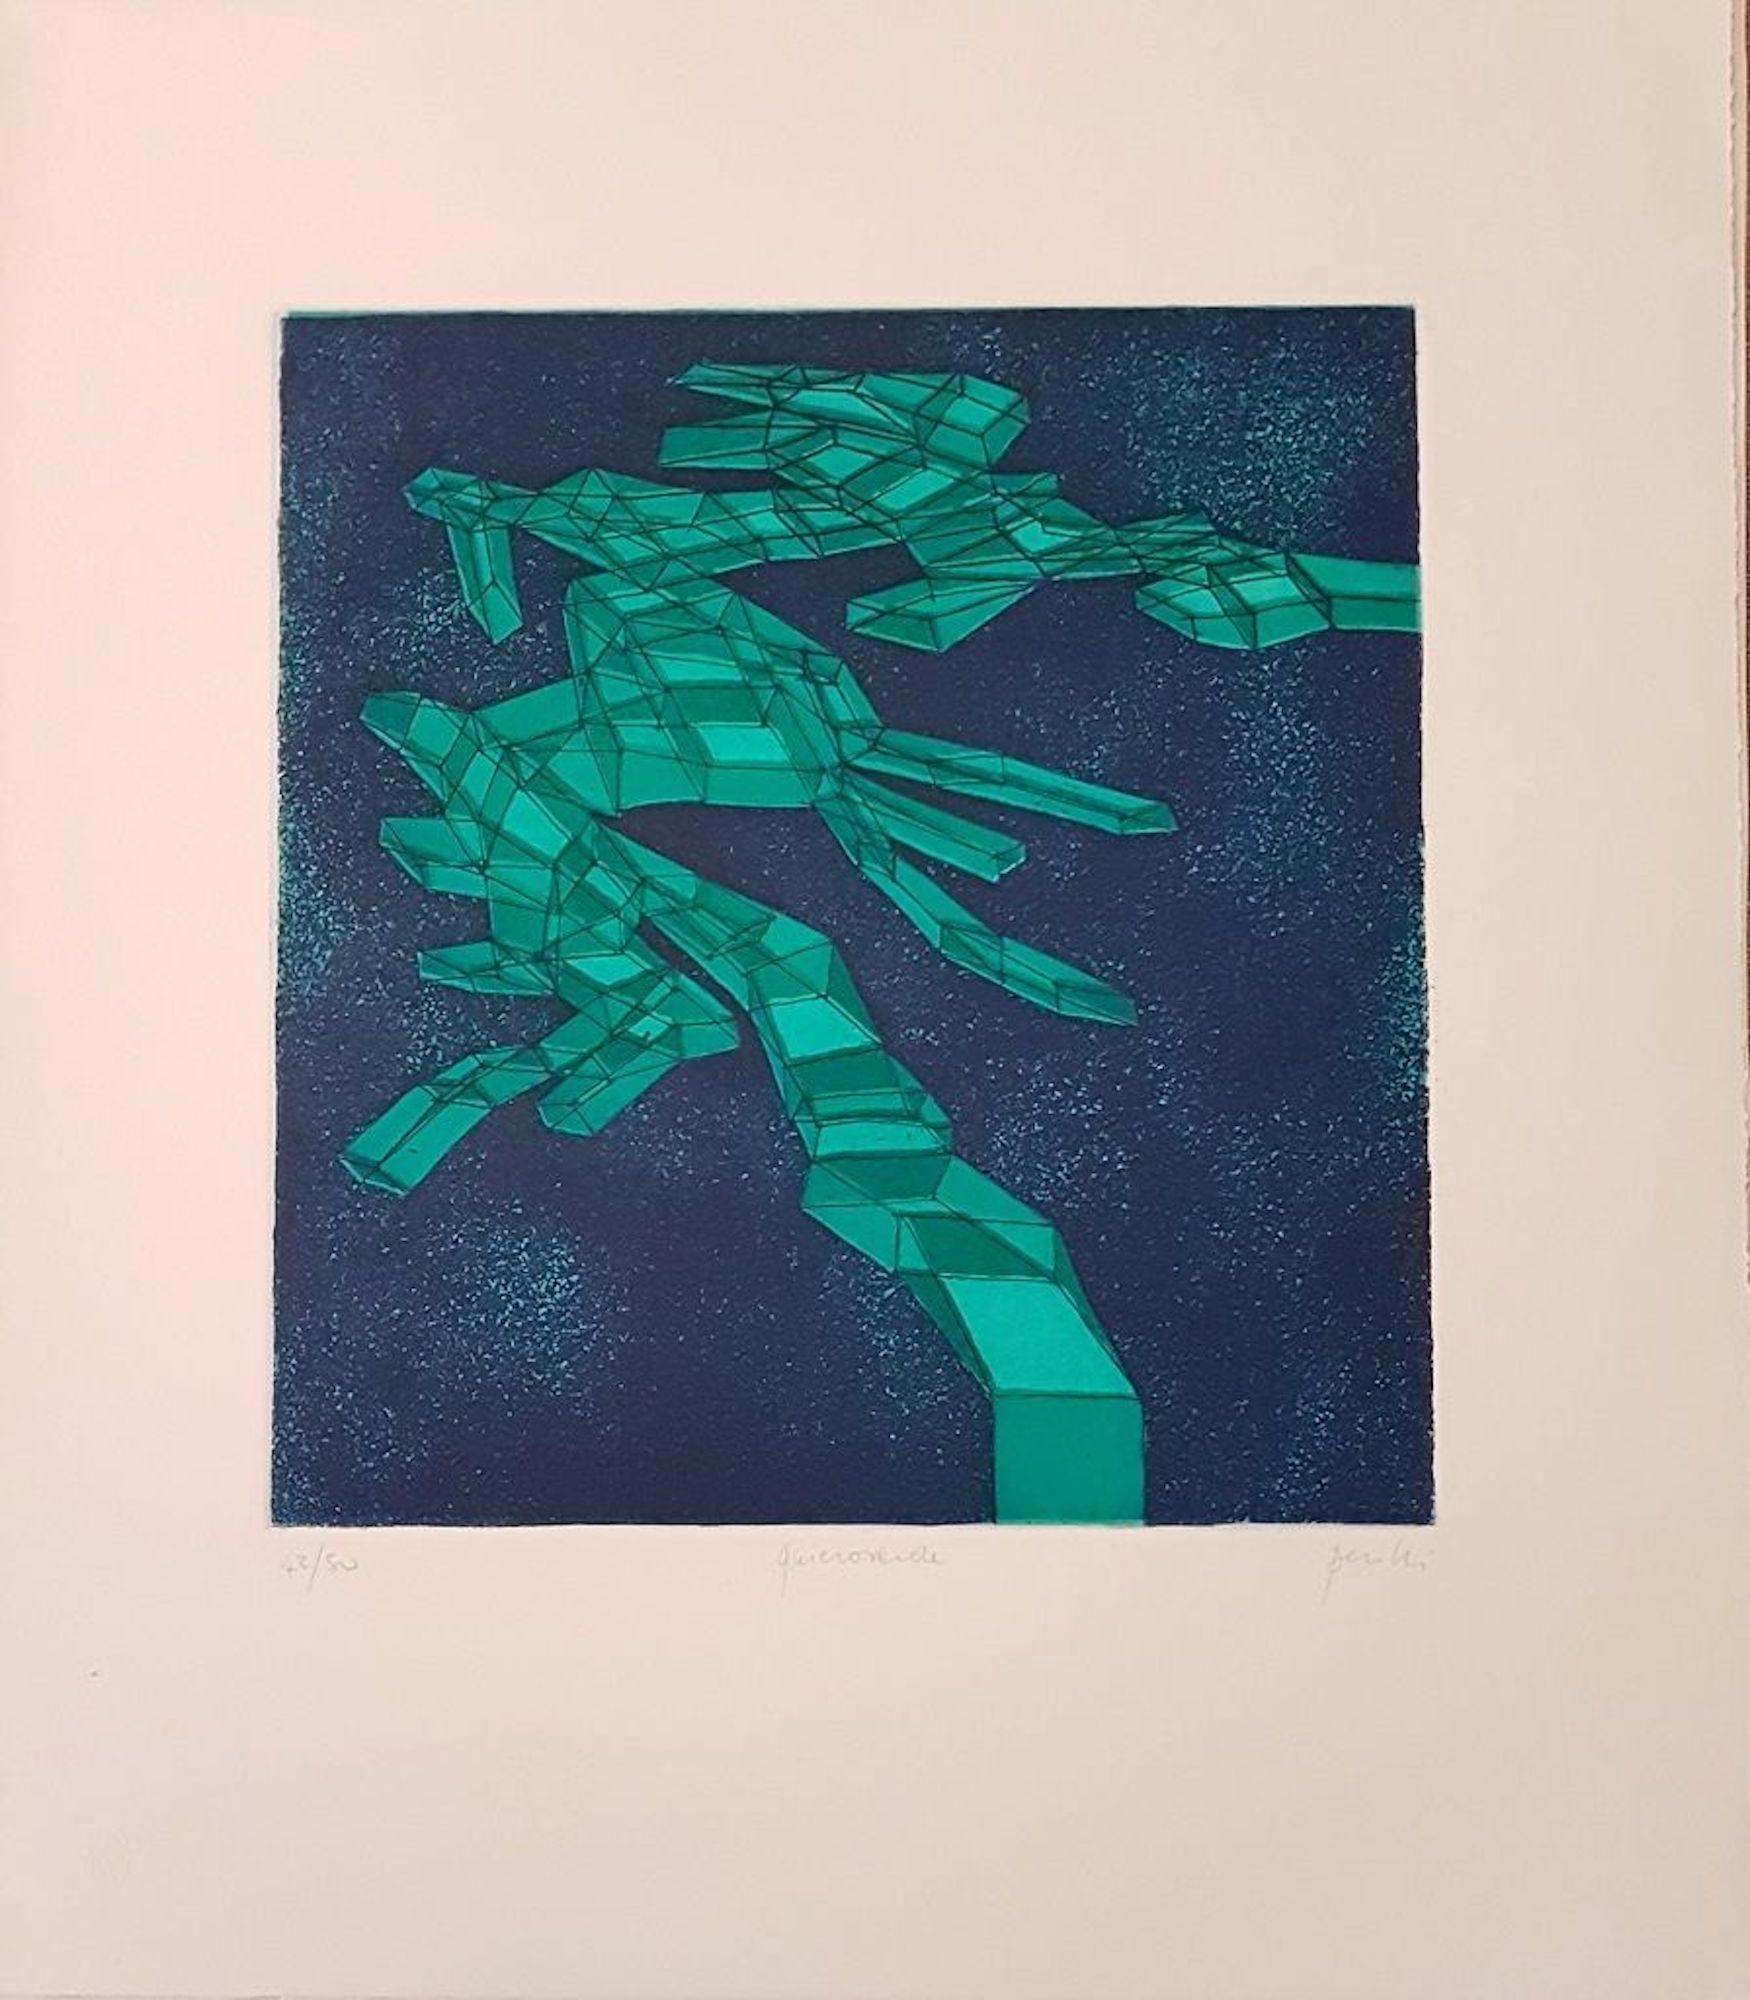 Quieroverde - Original Lithograph by Achille Perilli - 1971